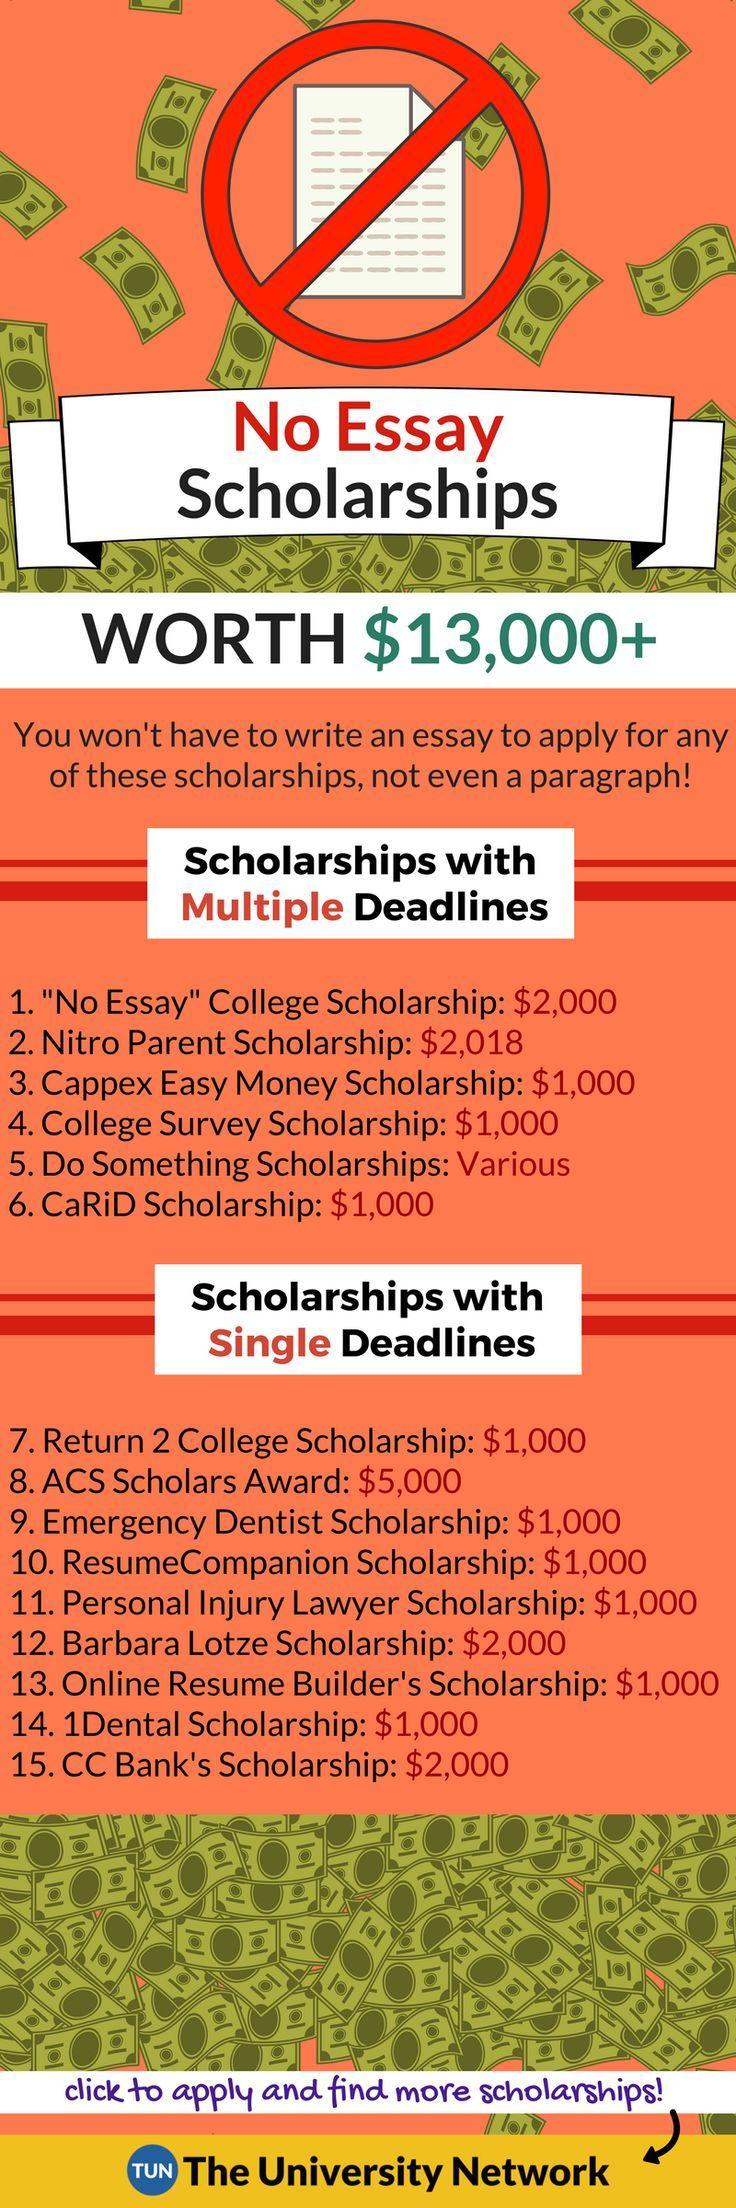 024 Essay Example No Scholarships For High School Rare Seniors 2017 2019 Full